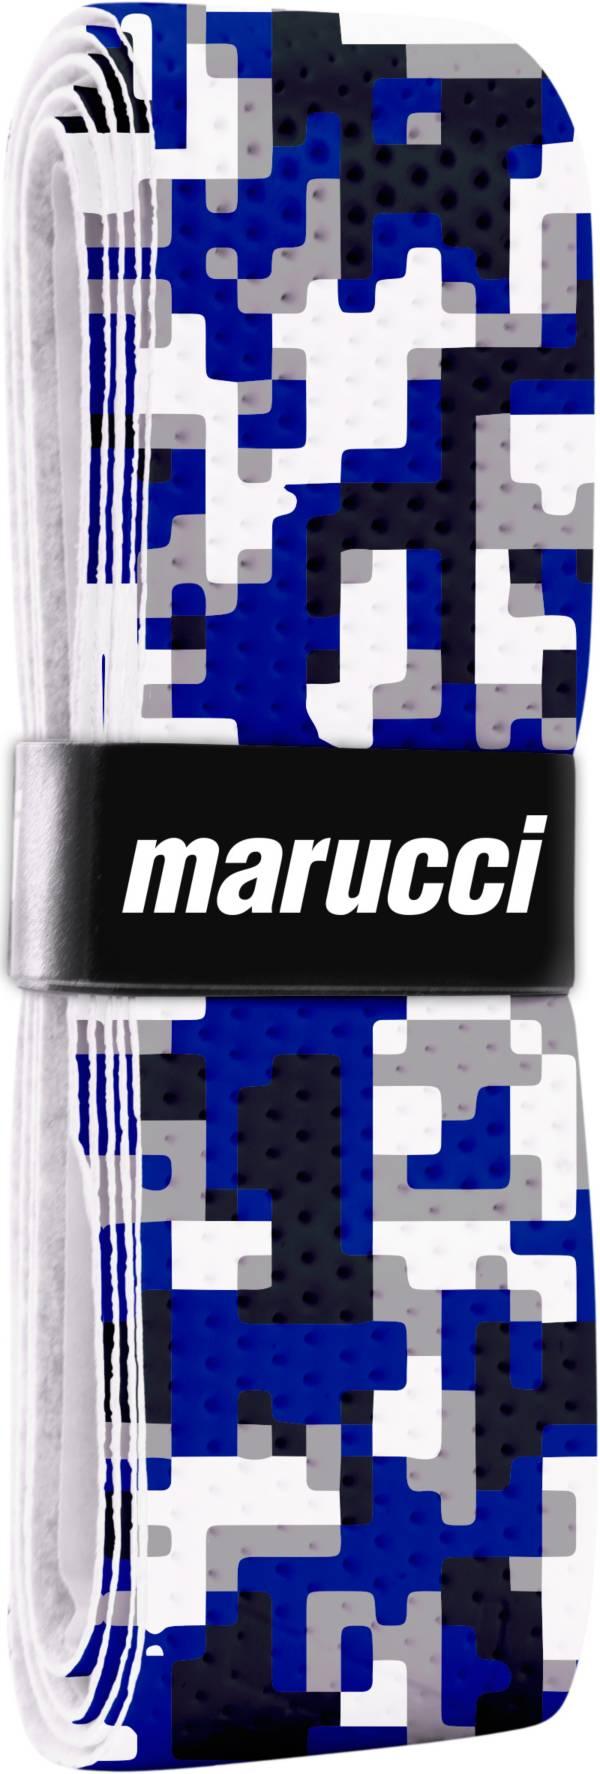 Marucci 1.0mm Bat Grip product image